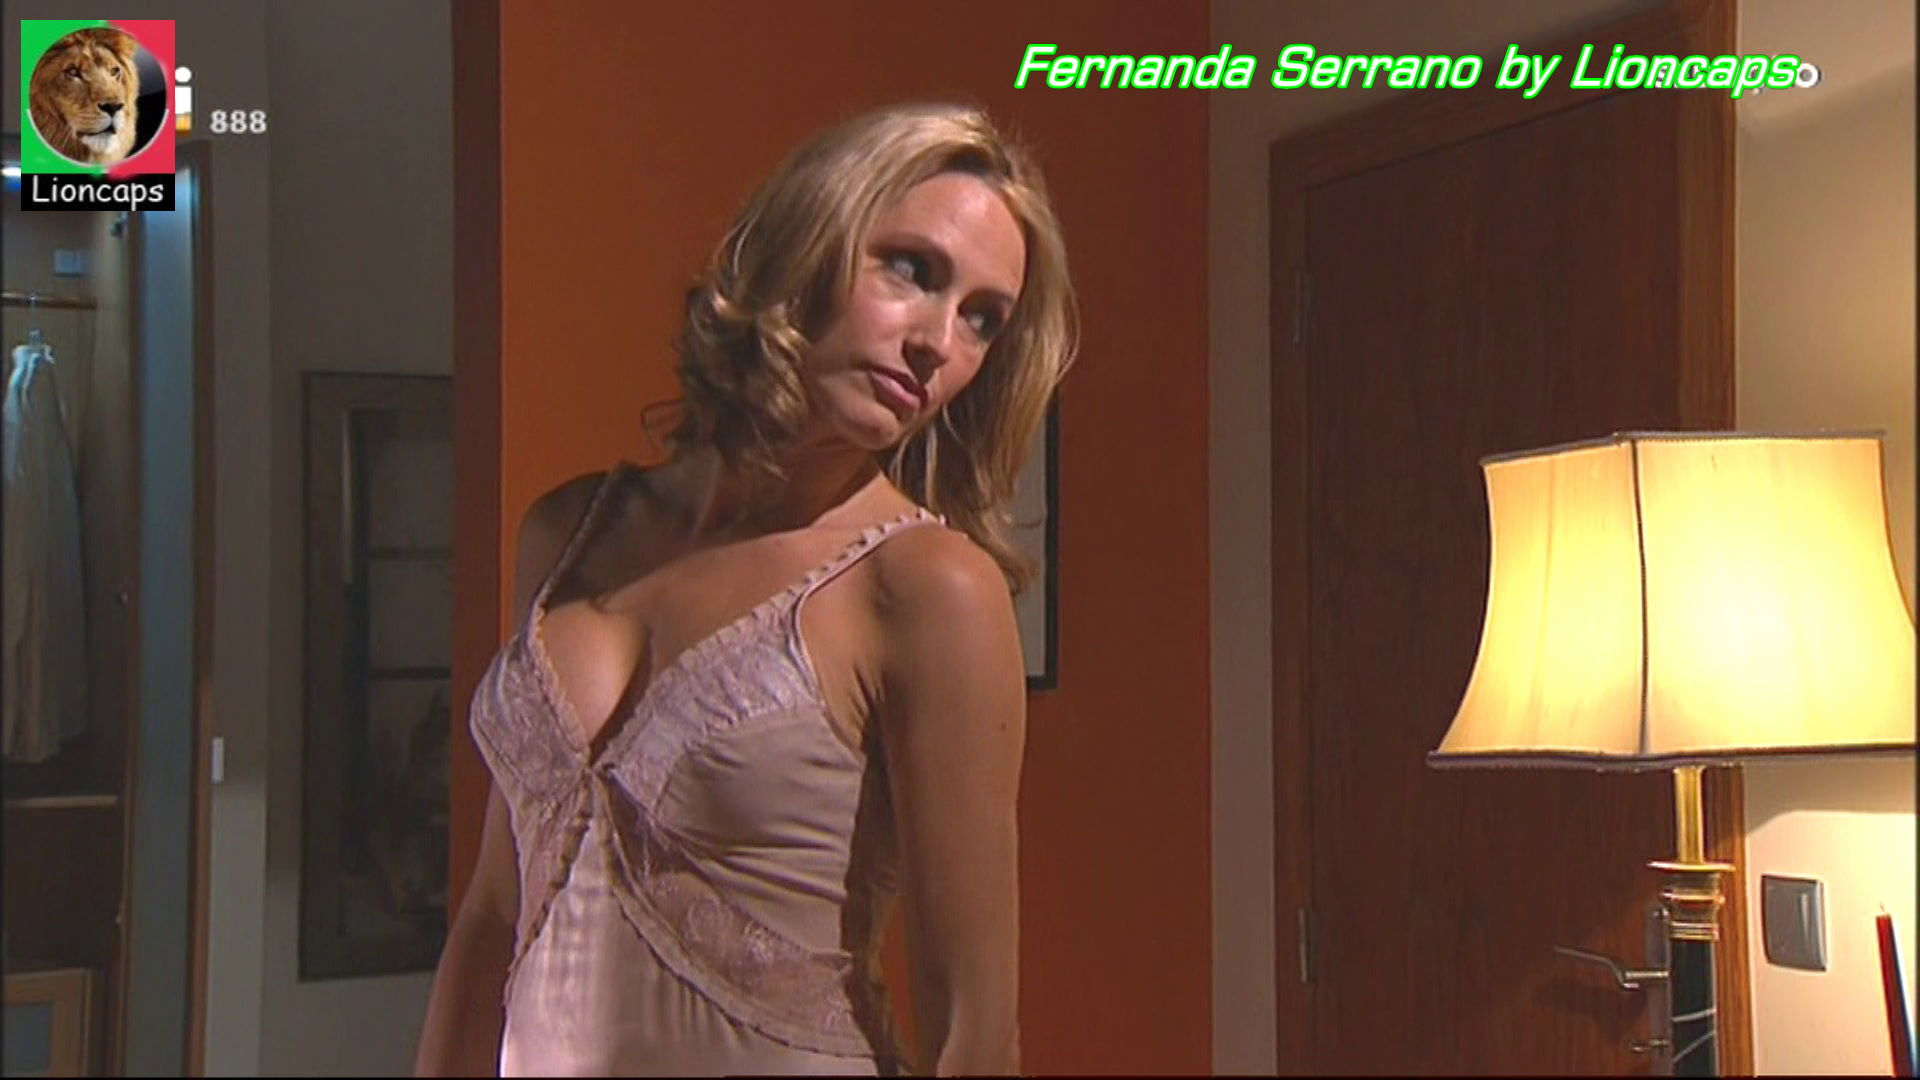 751566957_fernanda_serrano_vs180204_0308_122_1188lo.JPG